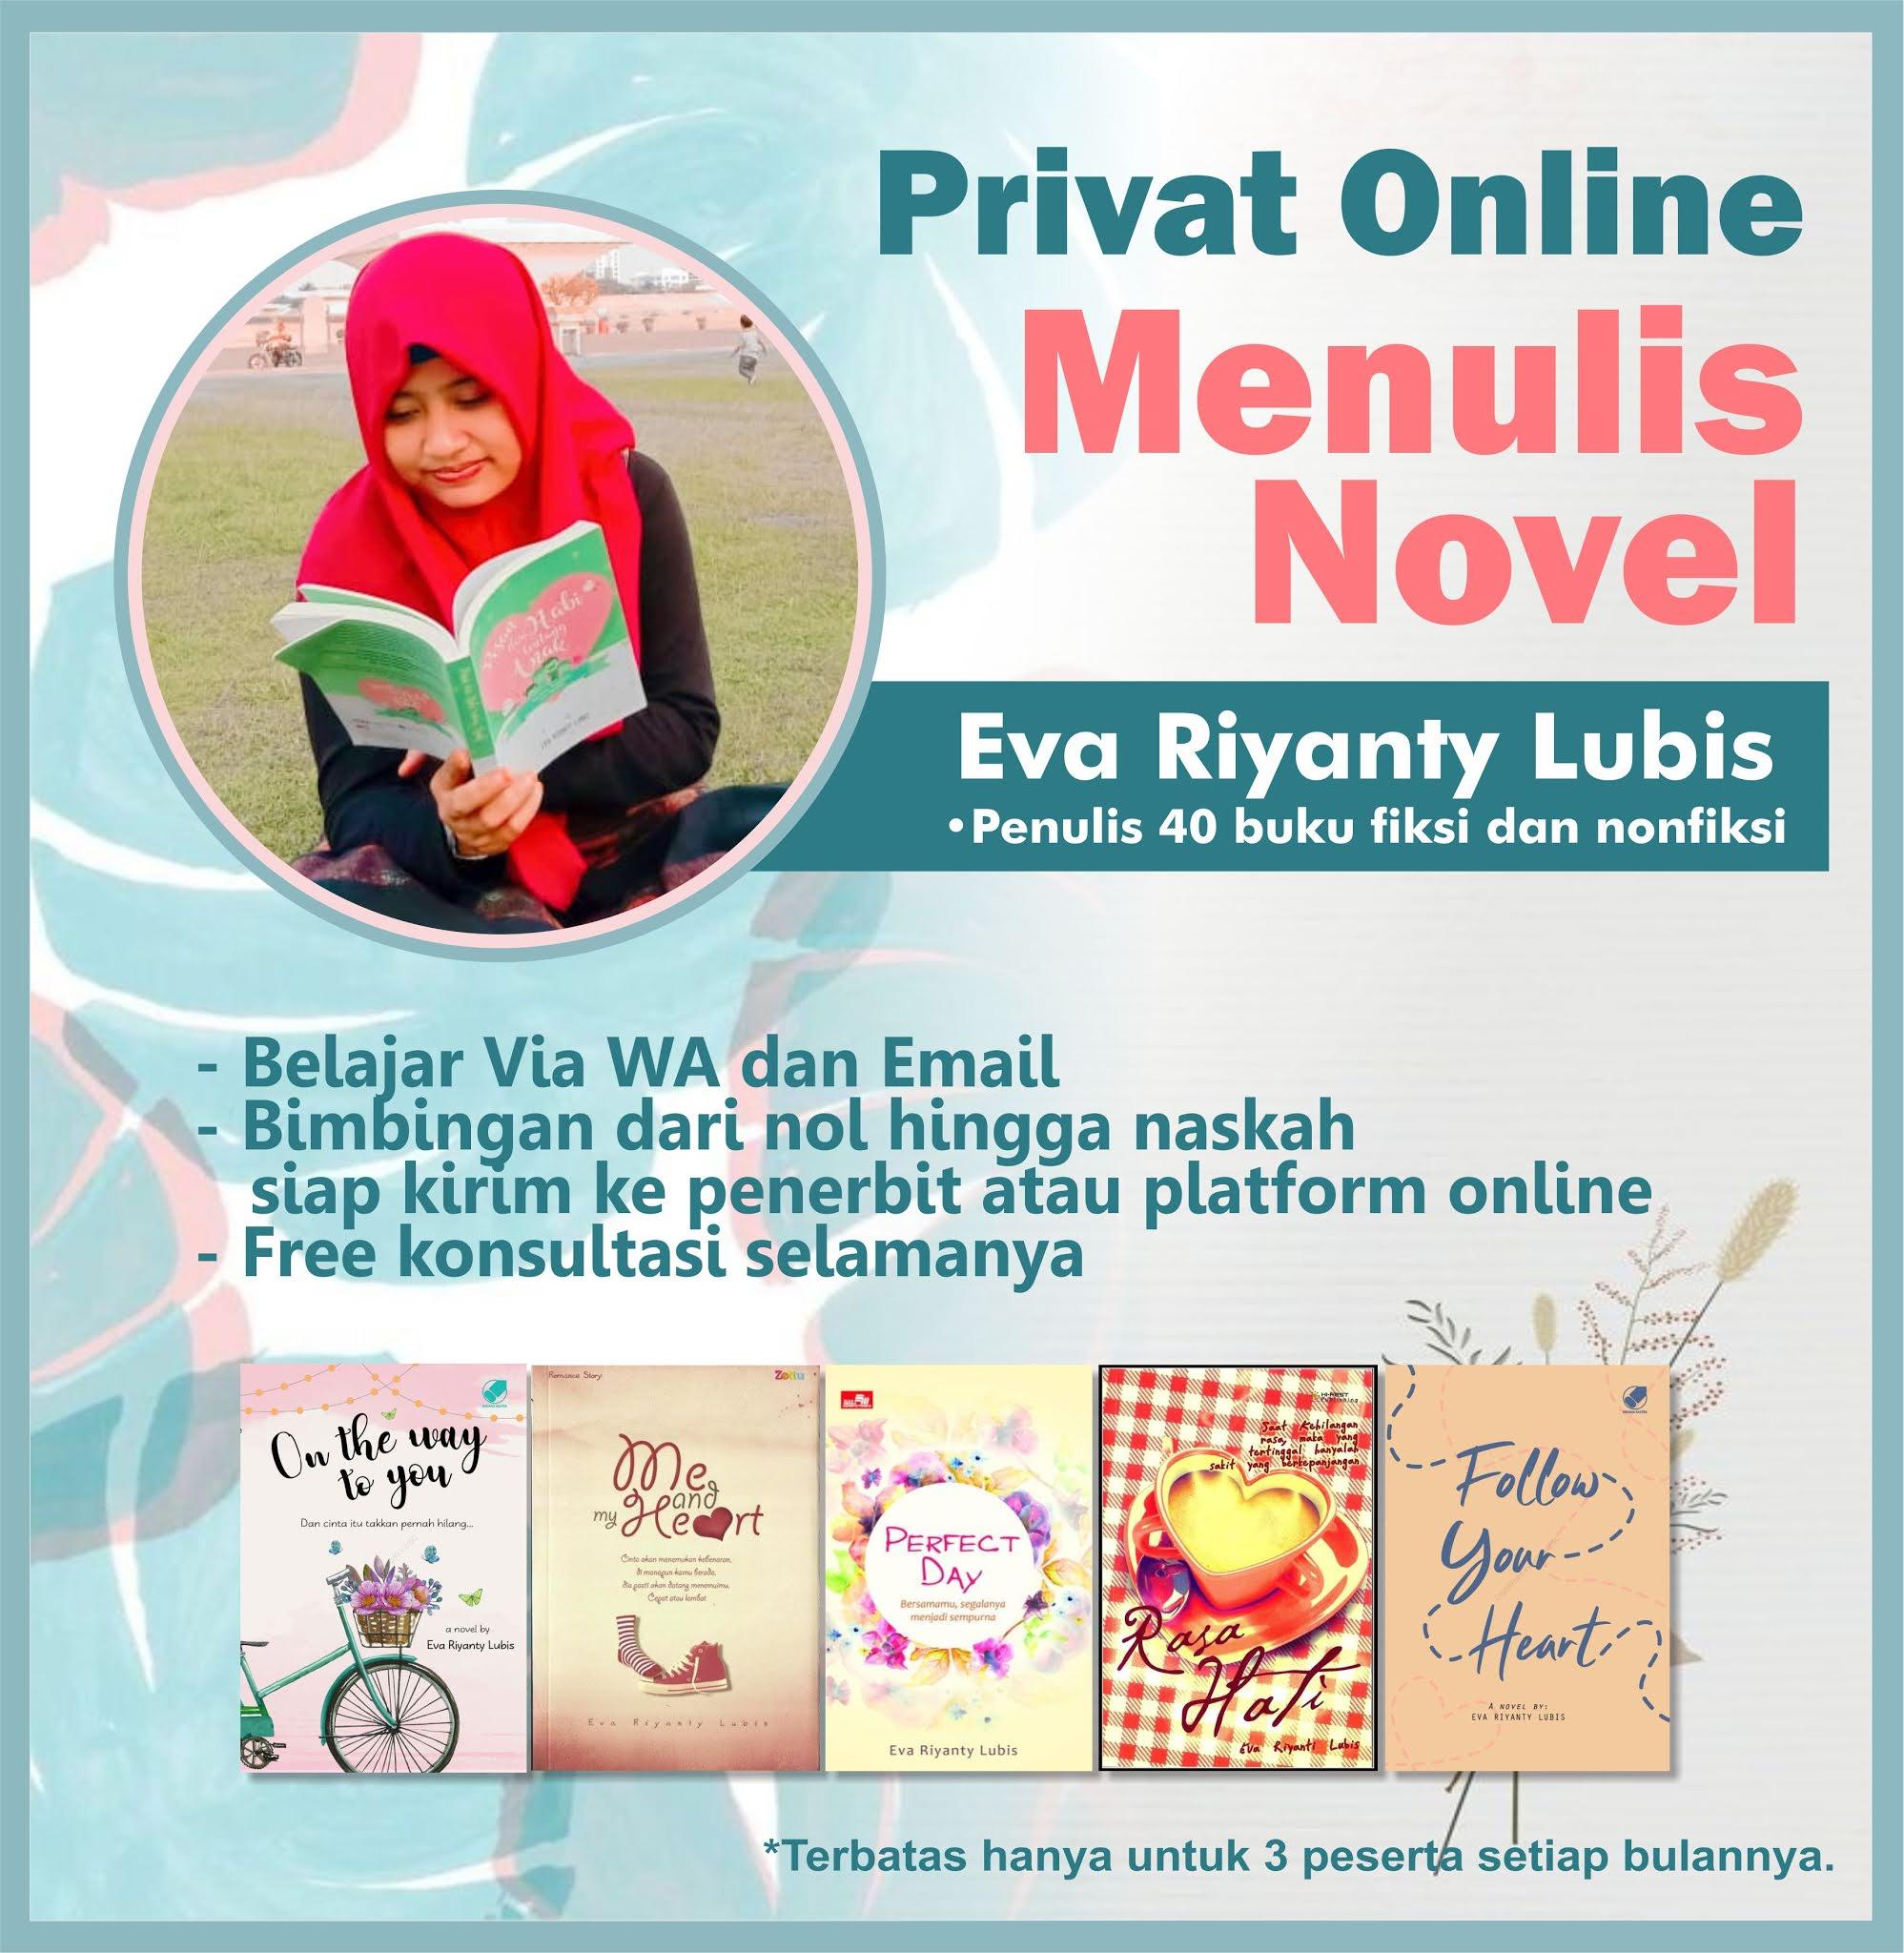 Bimbingan Privat Menulis Novel Online 2021